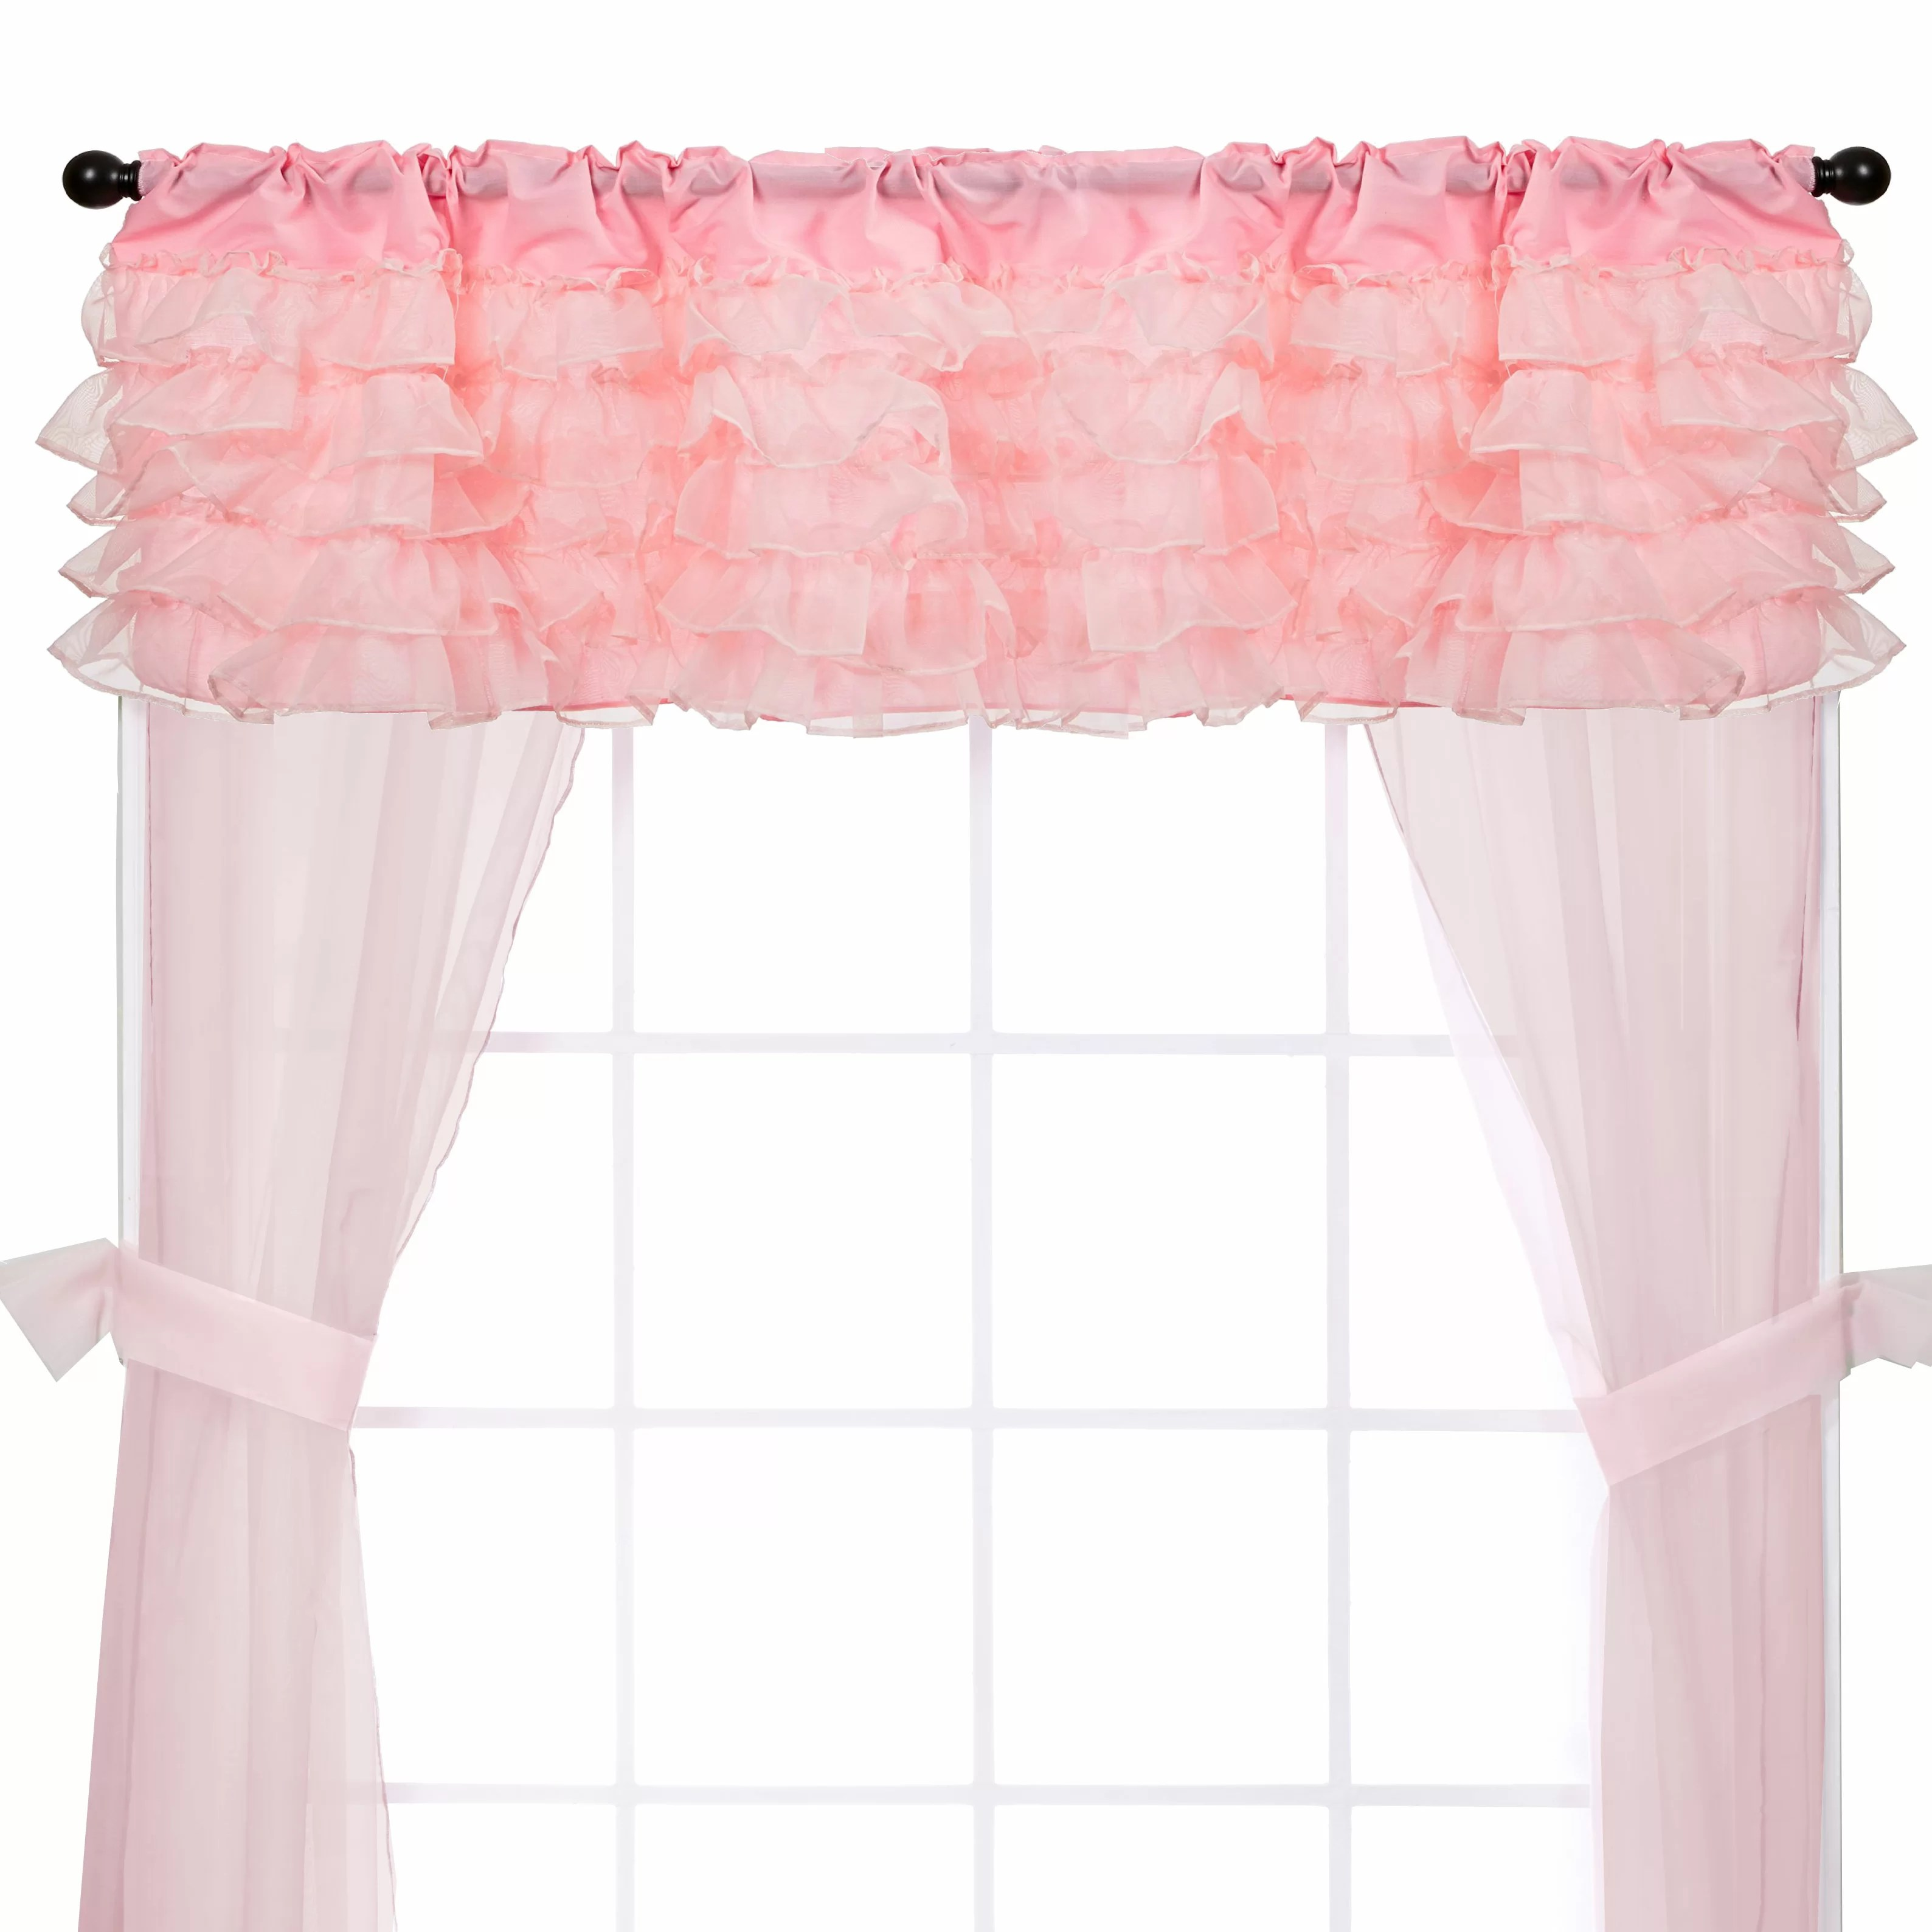 Babydoll Bedding 72 Curtain Valance